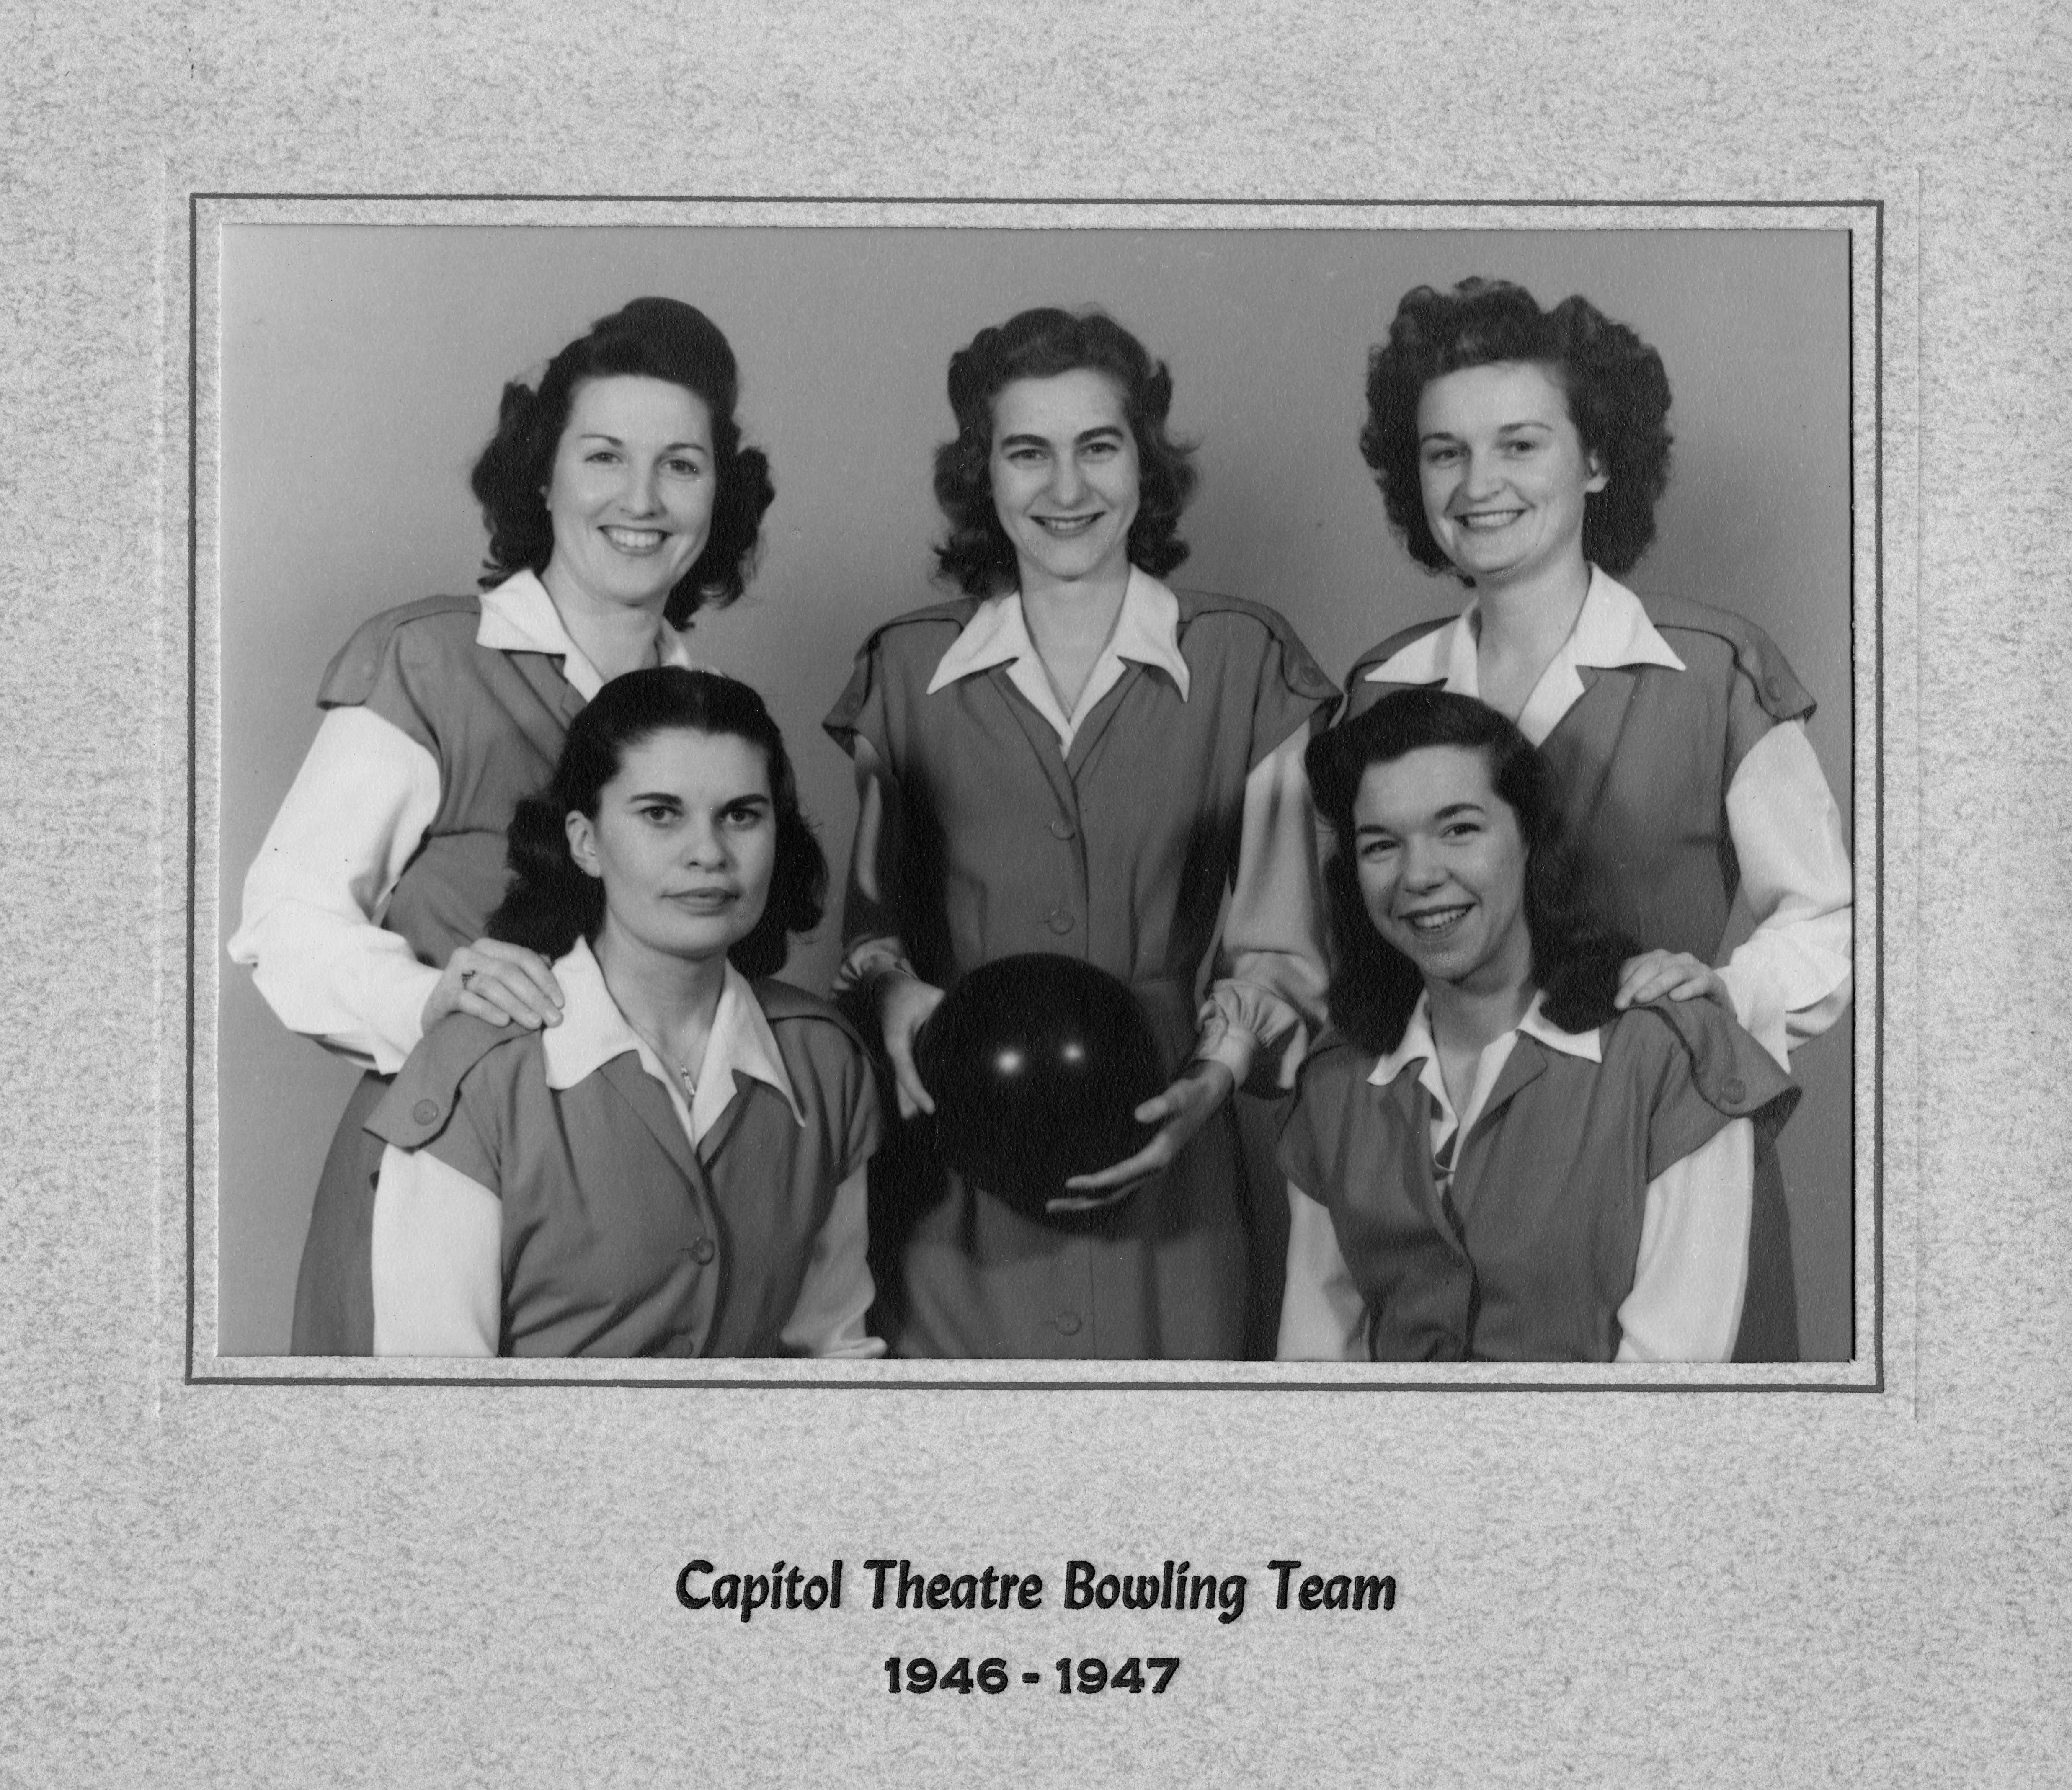 19461947 capitol theatre bowling team dover de 9200